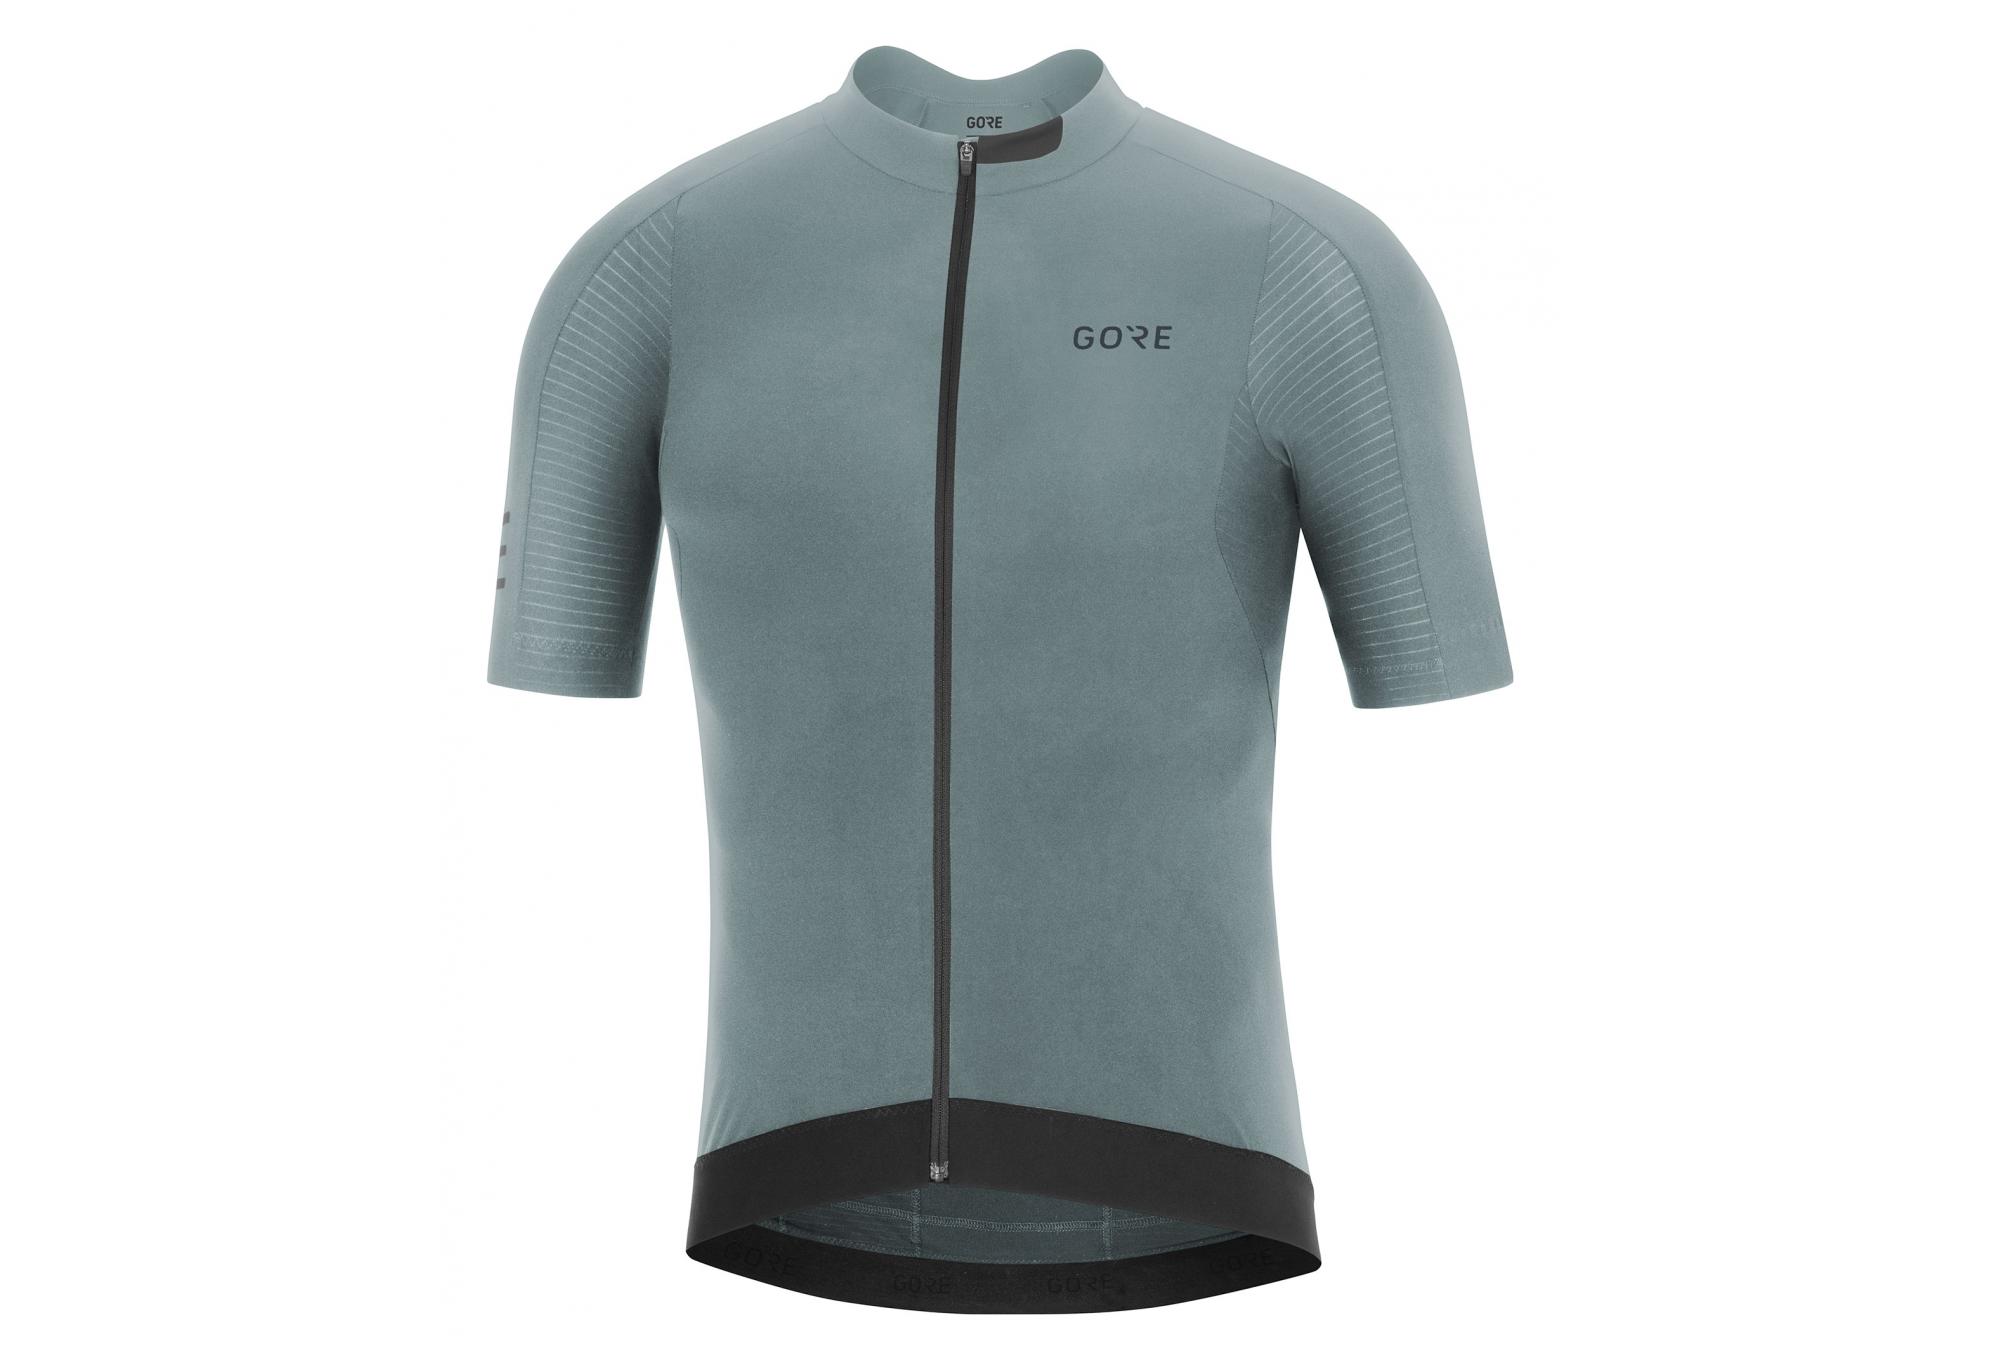 GORE C7 Race Short Sleeve Jersey Nordic Blue